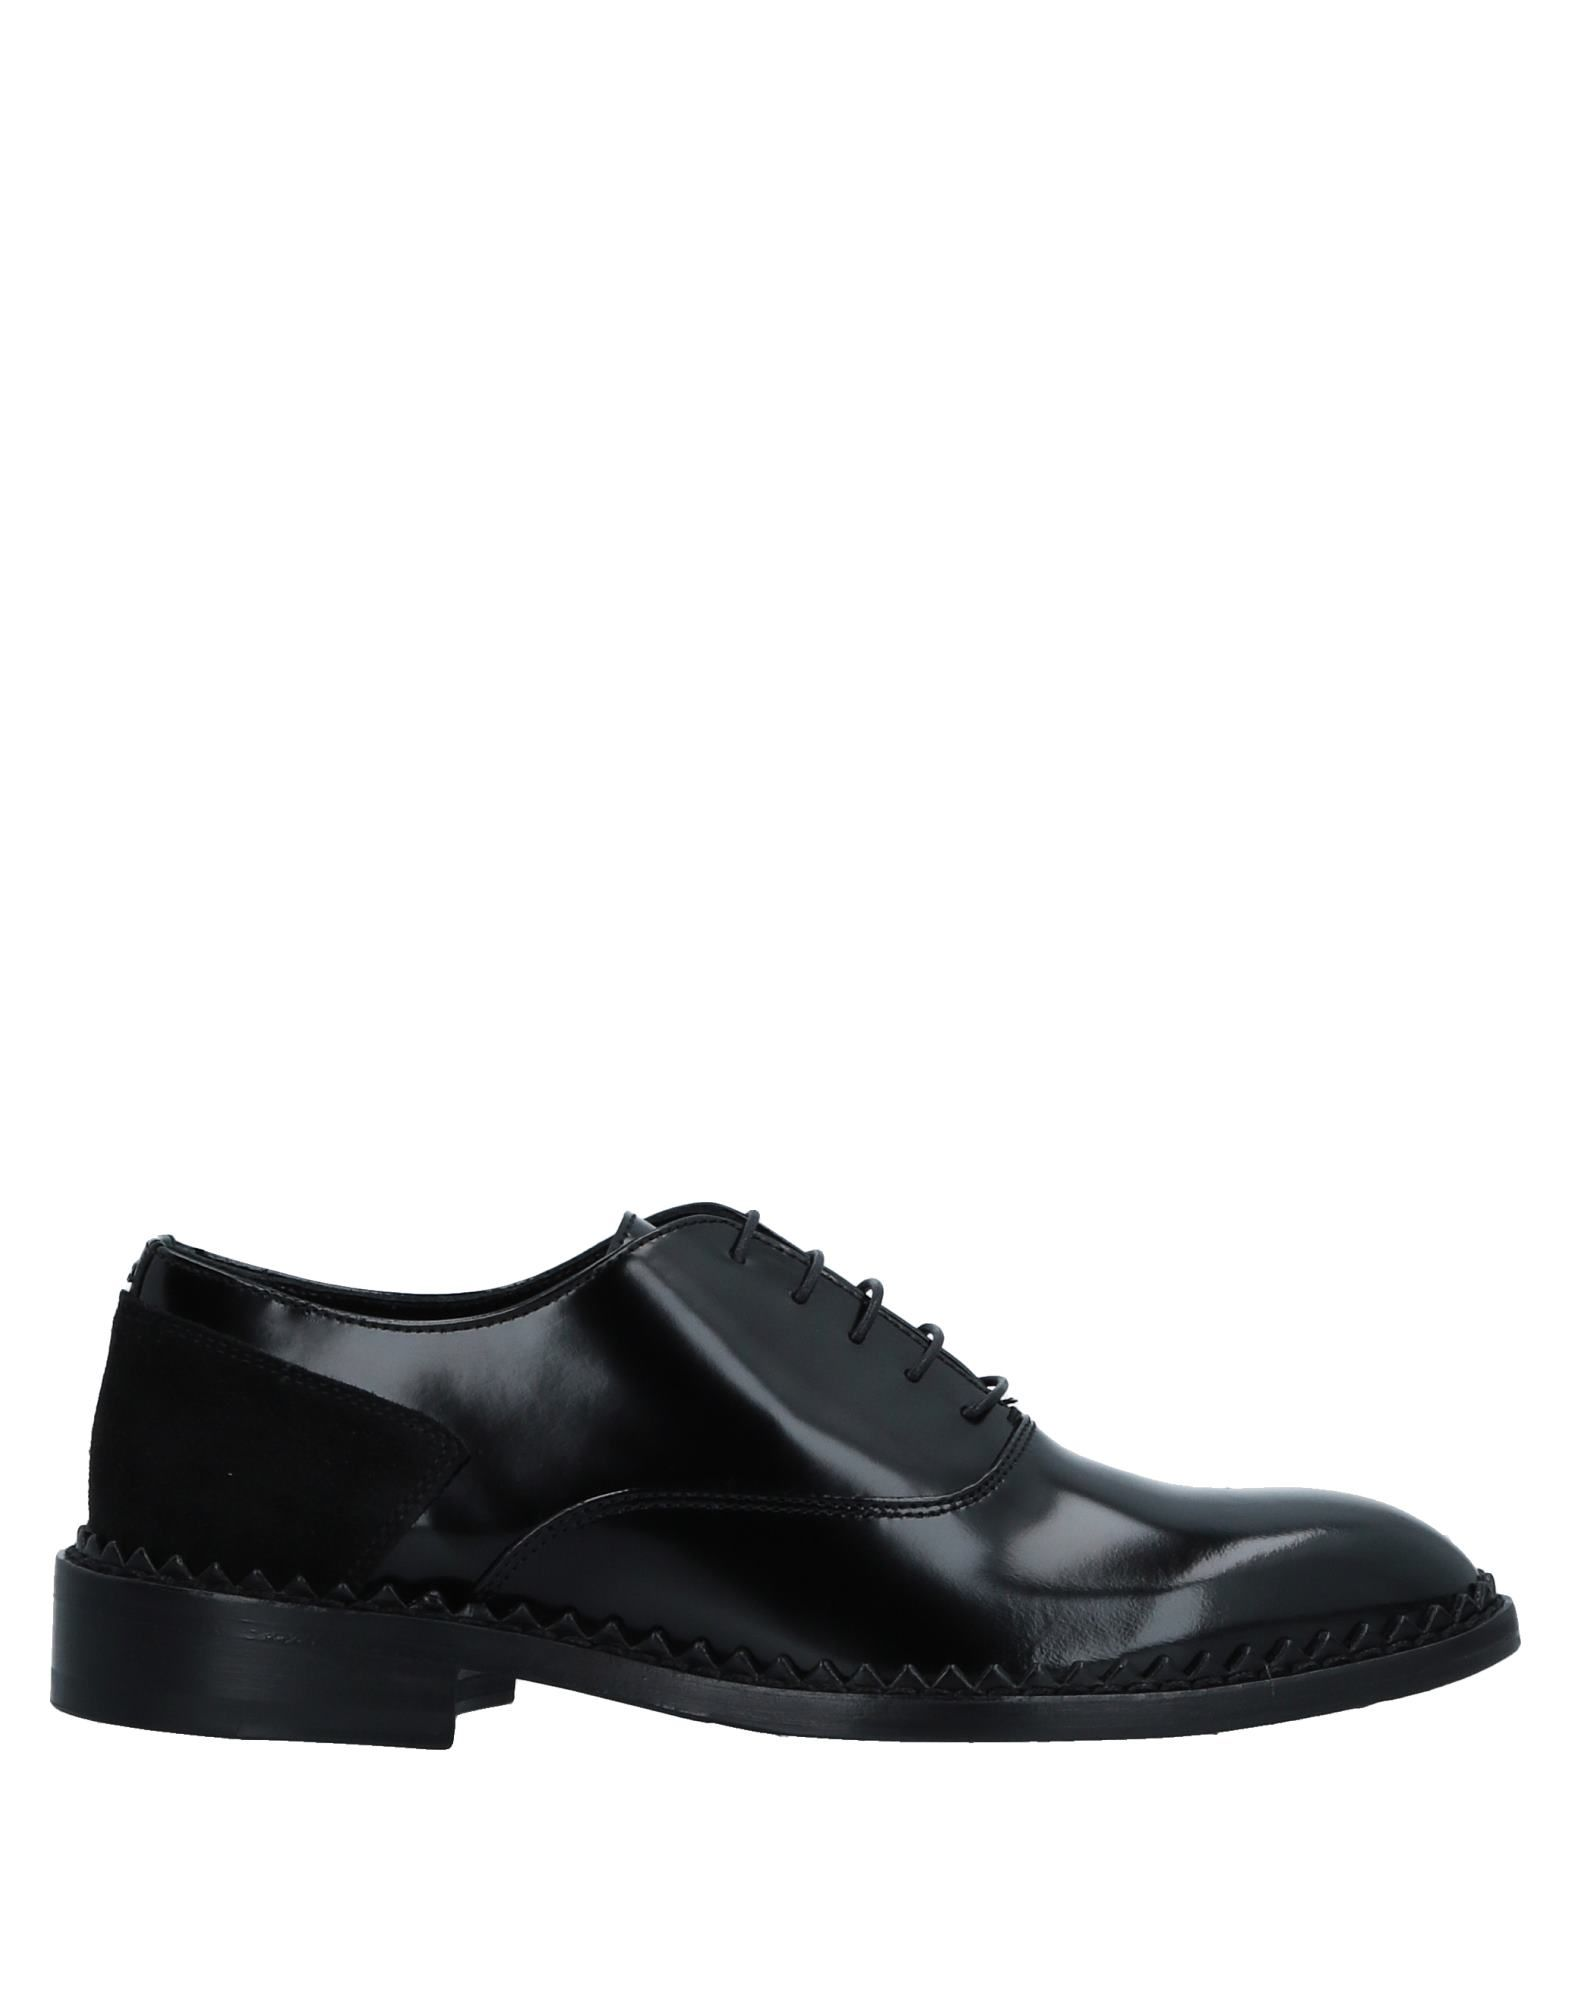 Stilvolle billige Schuhe John Galliano Schnürschuhe Damen  11516513RF